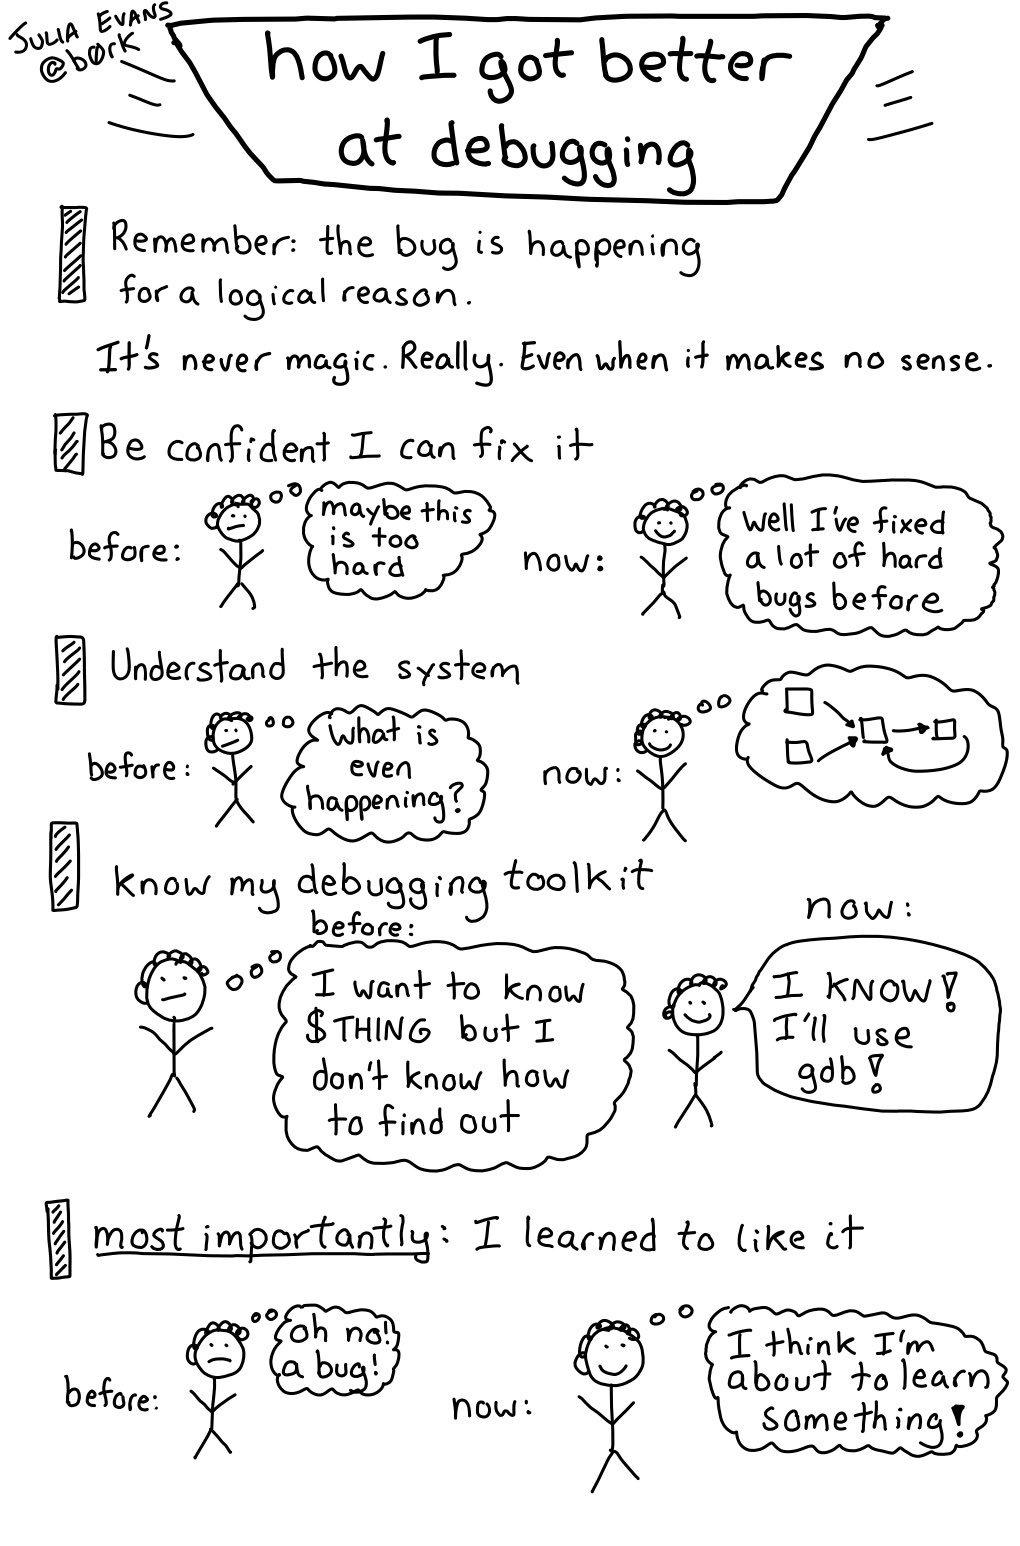 how I got better at debugging https://t.co/QaSc3xBa36